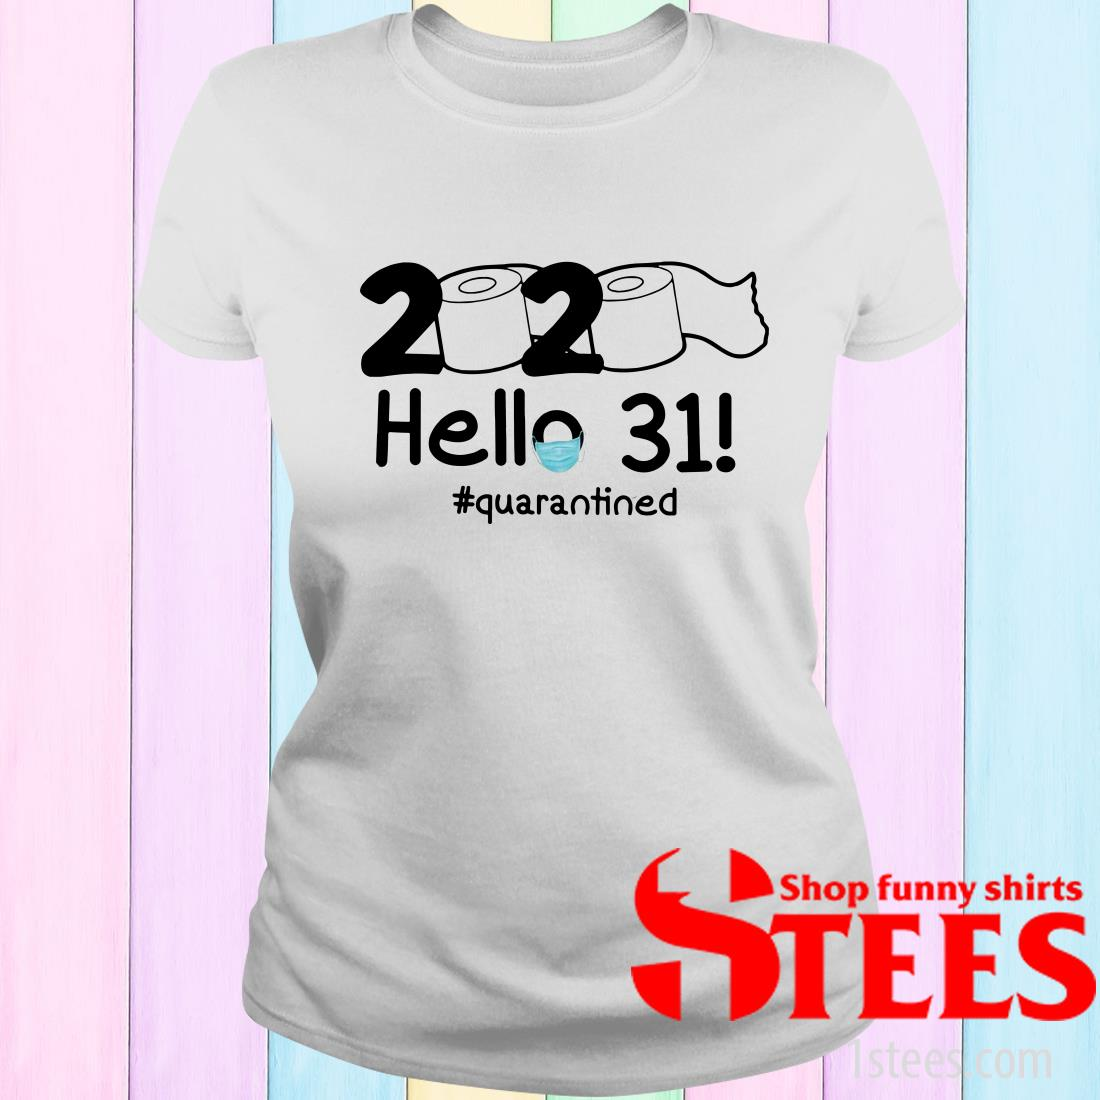 2020 Hello 31 #Quarantined Shirt